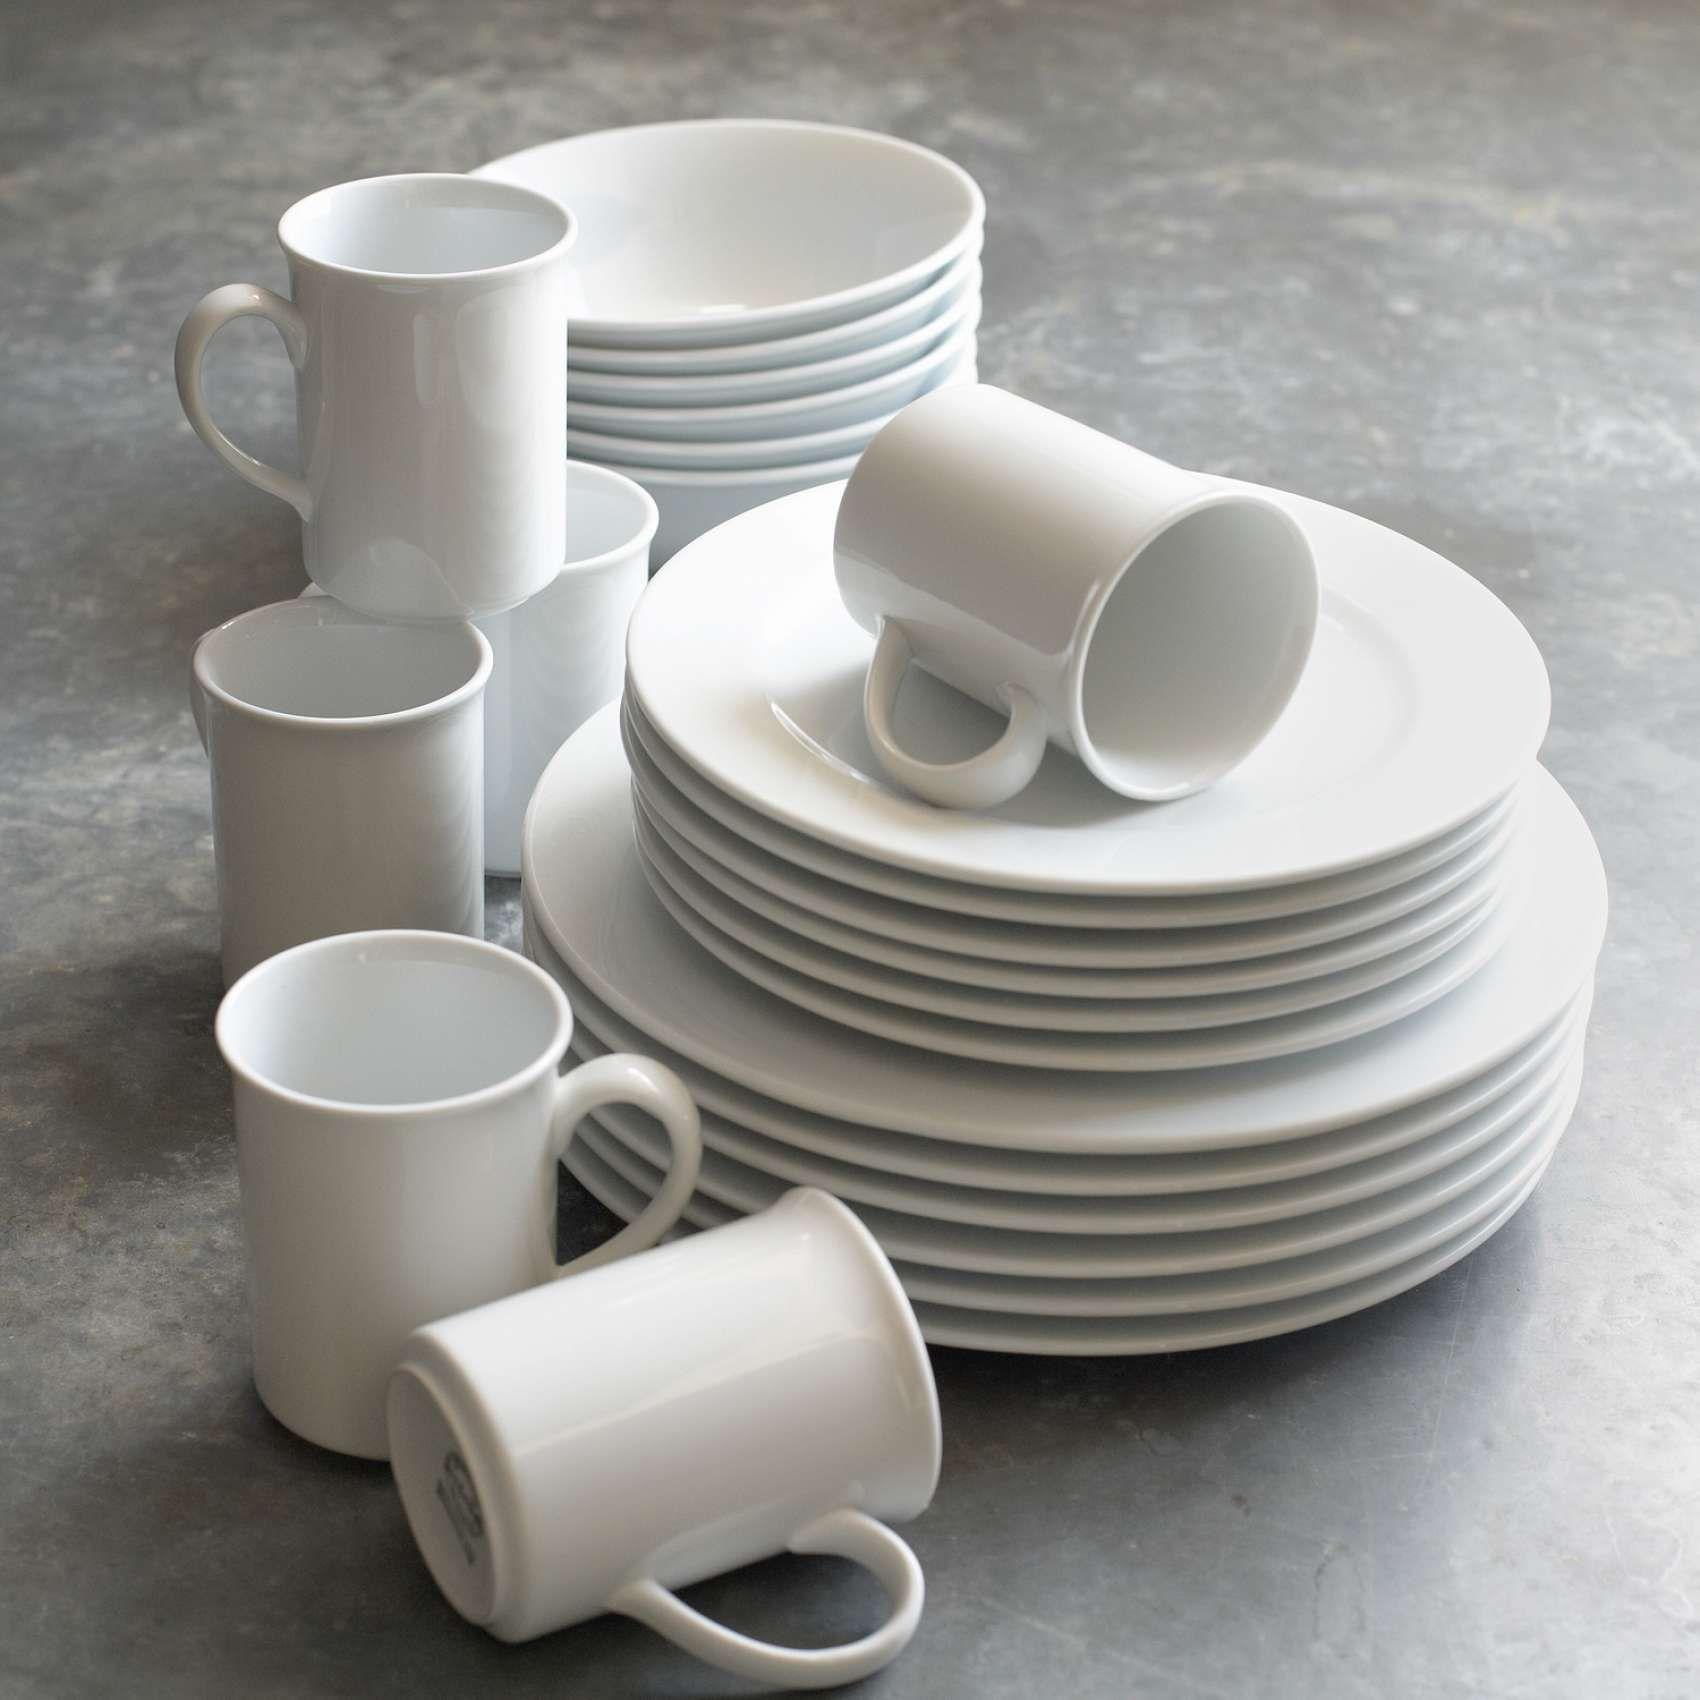 3cc9e63335aaeb39bac311bb2ddcb875.jpg & Sur La Table - Bistro style dinnerware set | Hiroko\u0027s kitchen ...